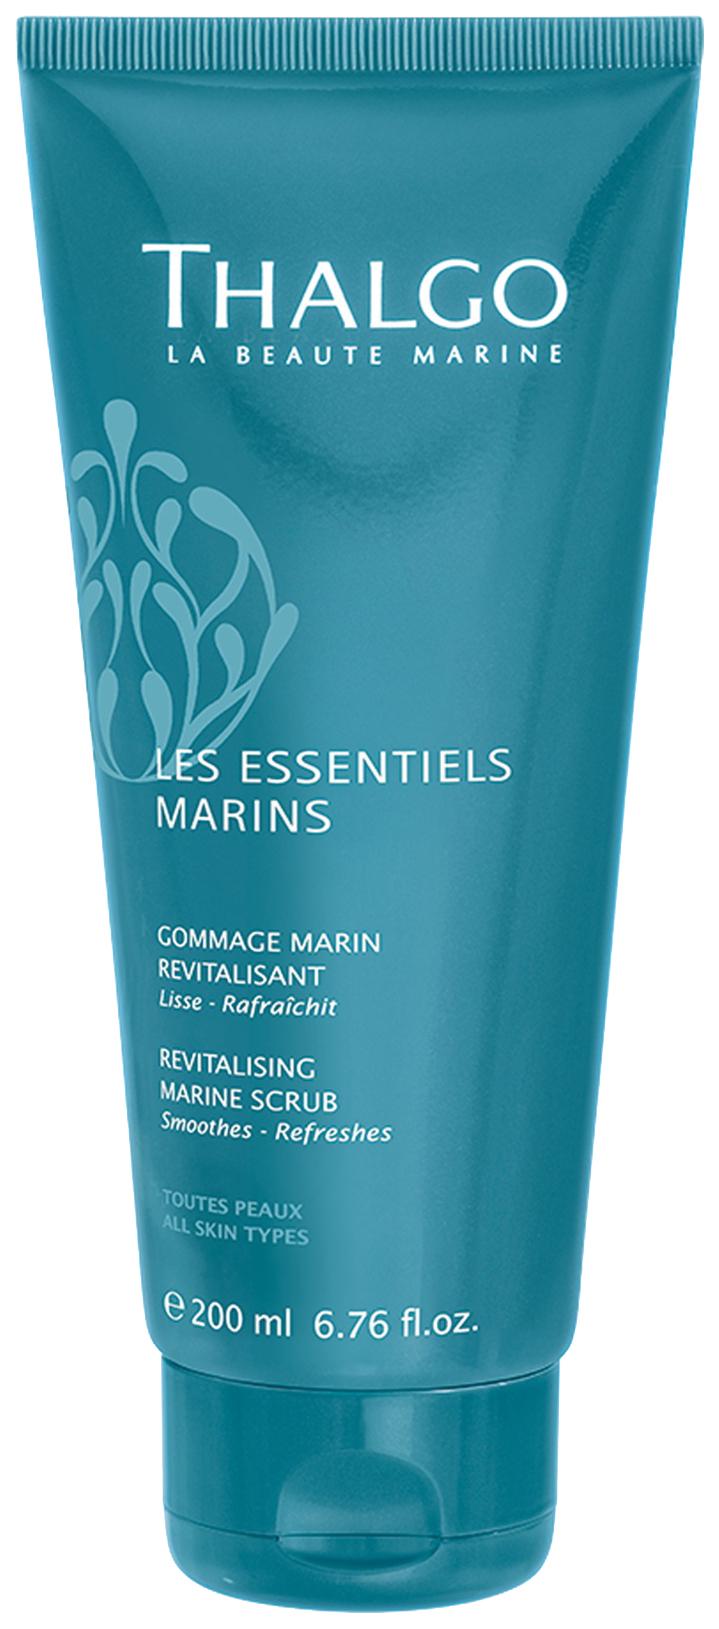 Купить Скраб для тела Thalgo Les Essentiels Marins Revitalising Marine Scrub 200 мл